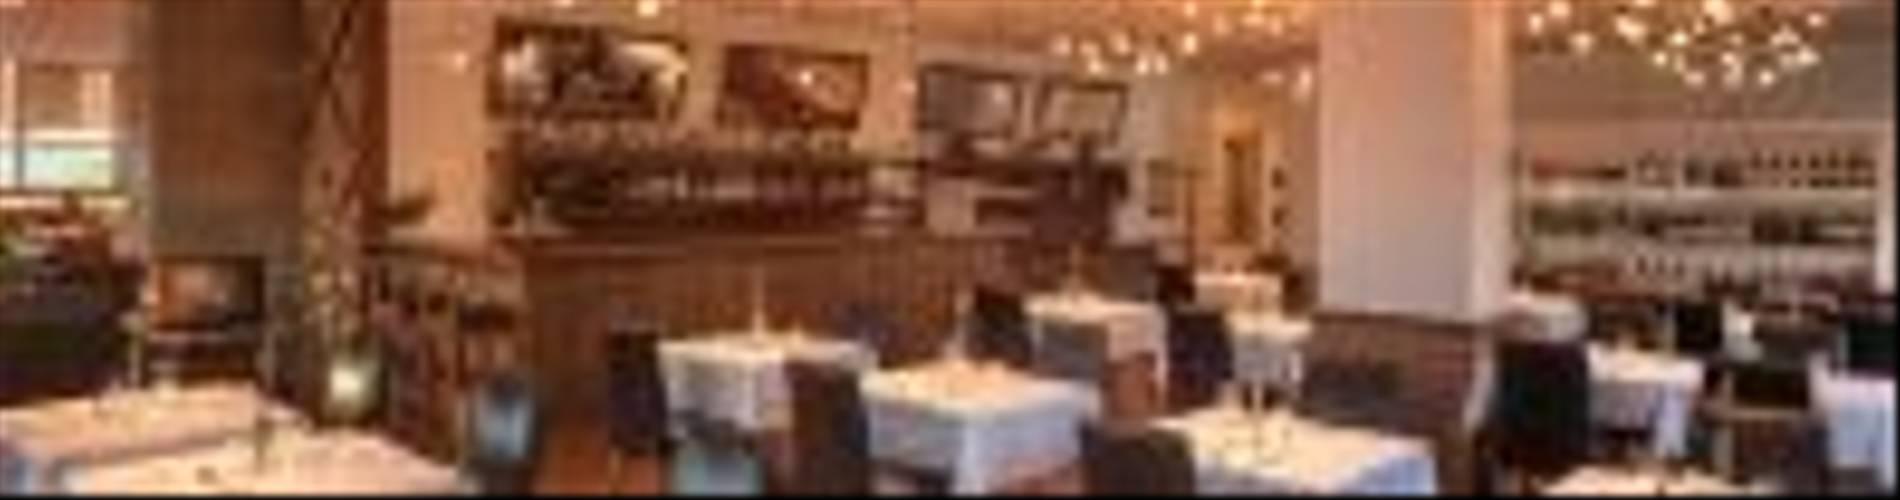 HotelResidence_DIOKLECIJAN_restaurant-dinner-interior-panorama_2048px_DSC04132-198x120.jpg